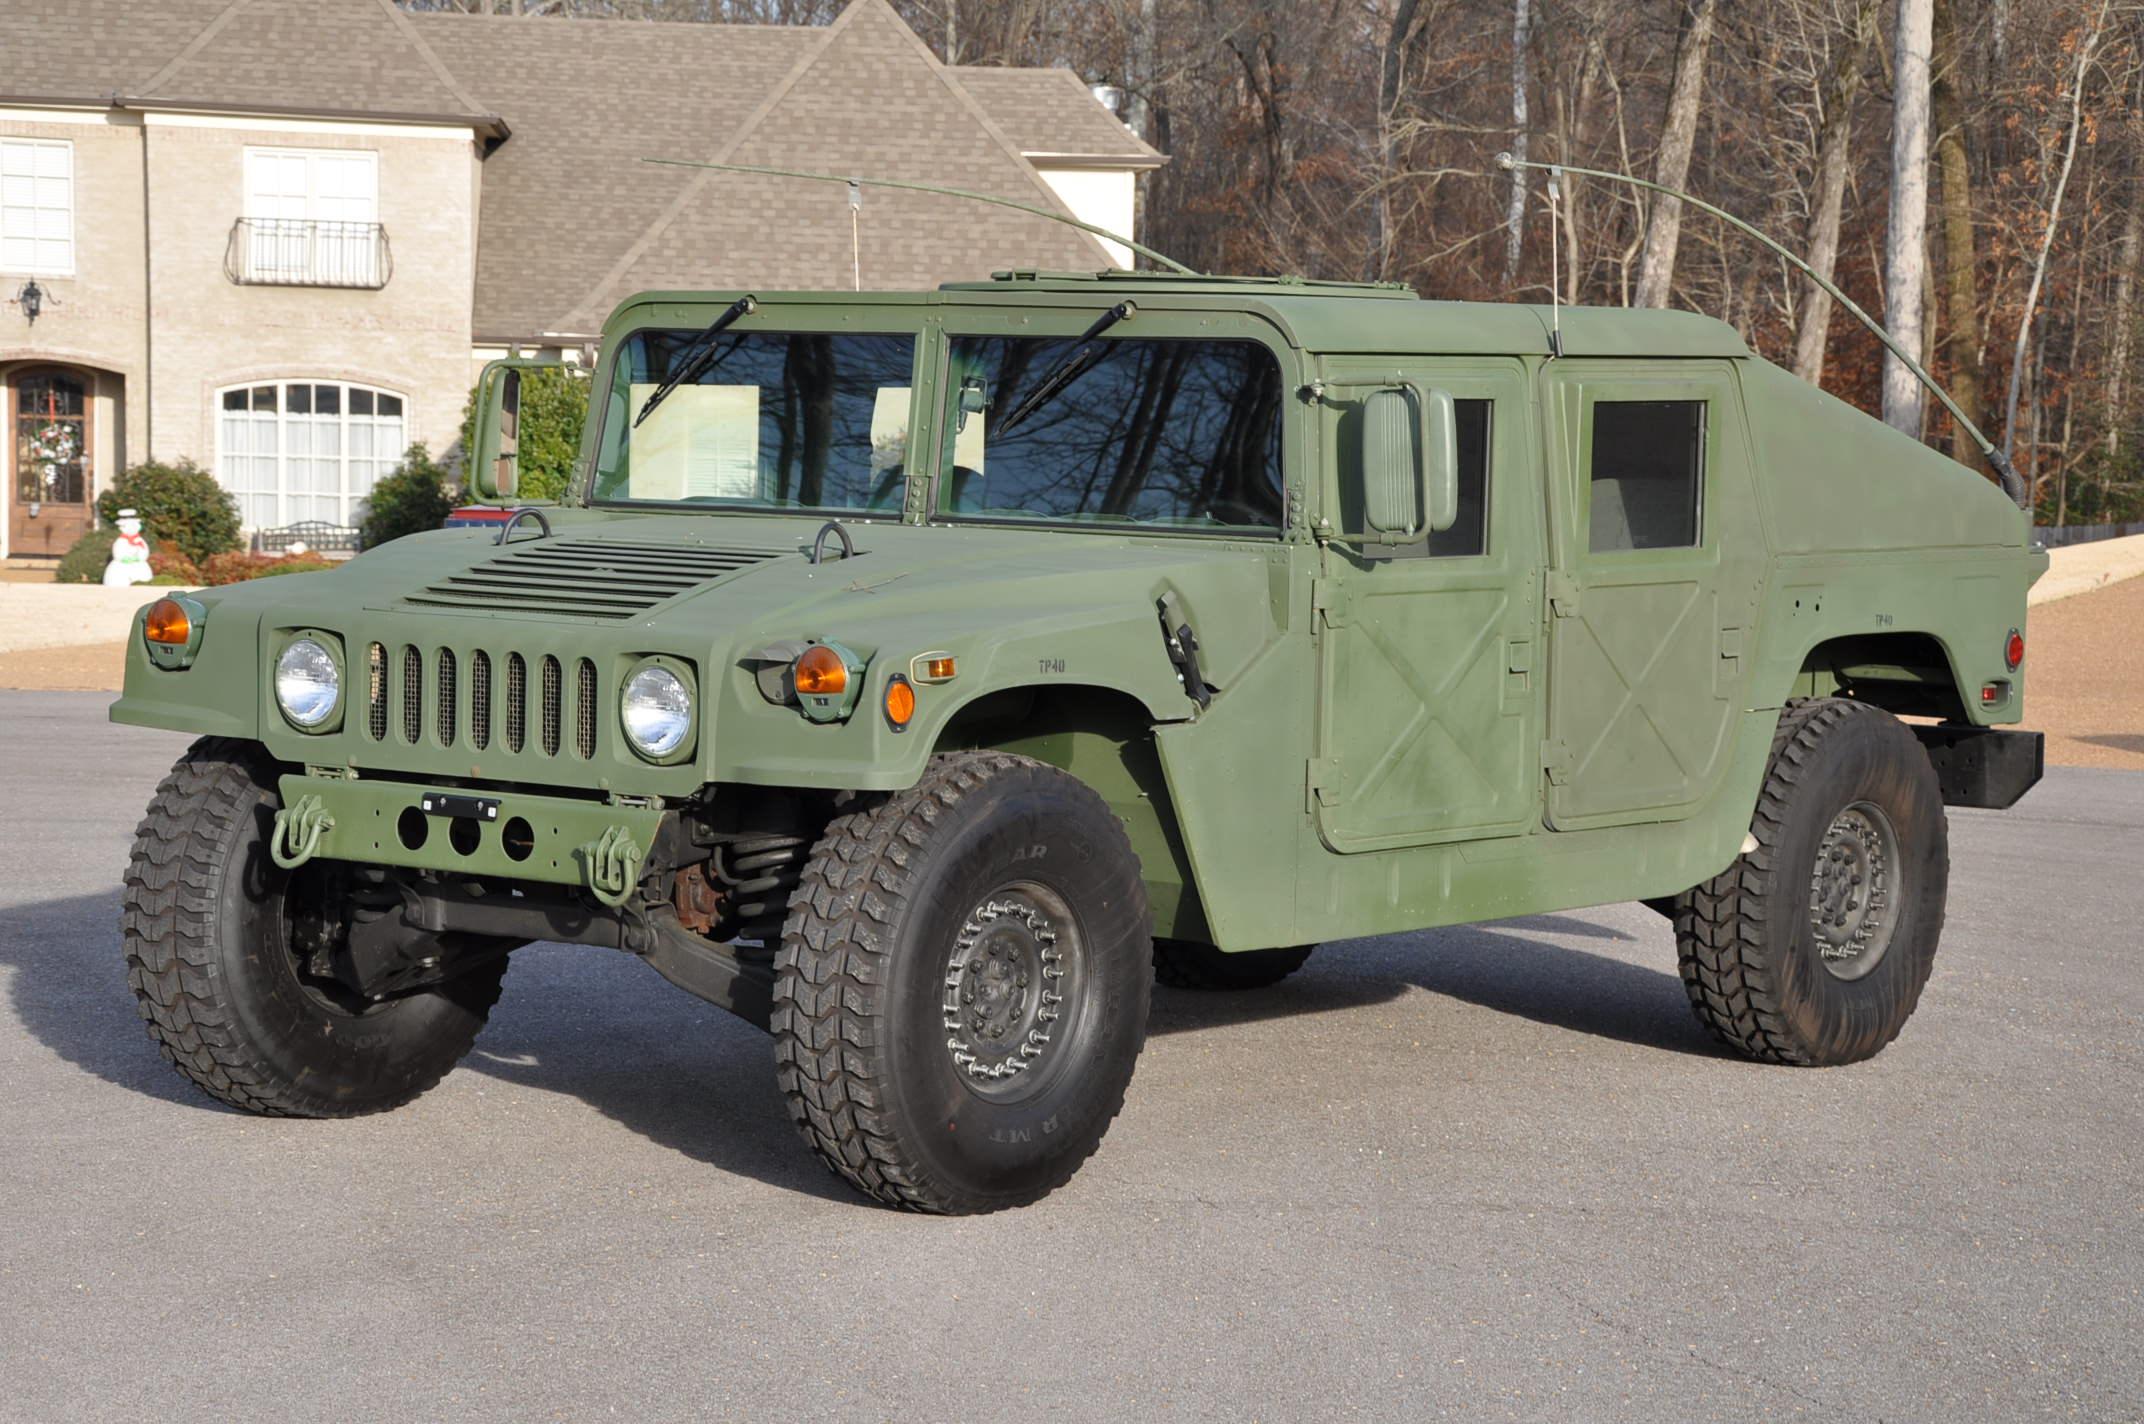 hmmwv m1025 hummer h1 humvee military army slantback vehicle custom variants builds humvees hmmwvs accessories defense dsc